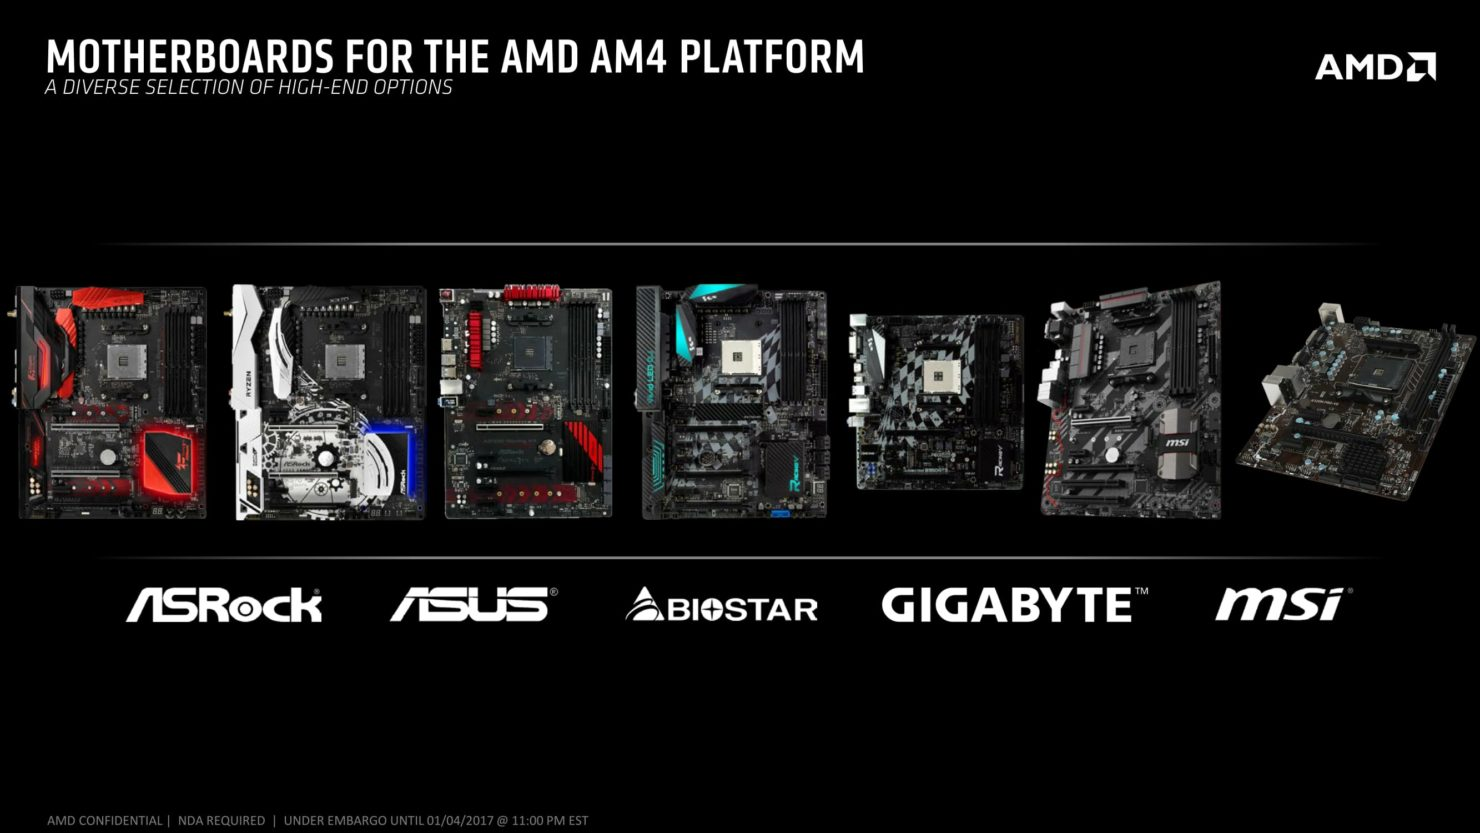 amd-warns-motherboard-makers-from-offering-ryzen-5000-desktop-cpu-bios-support-on-am4-x370-boards